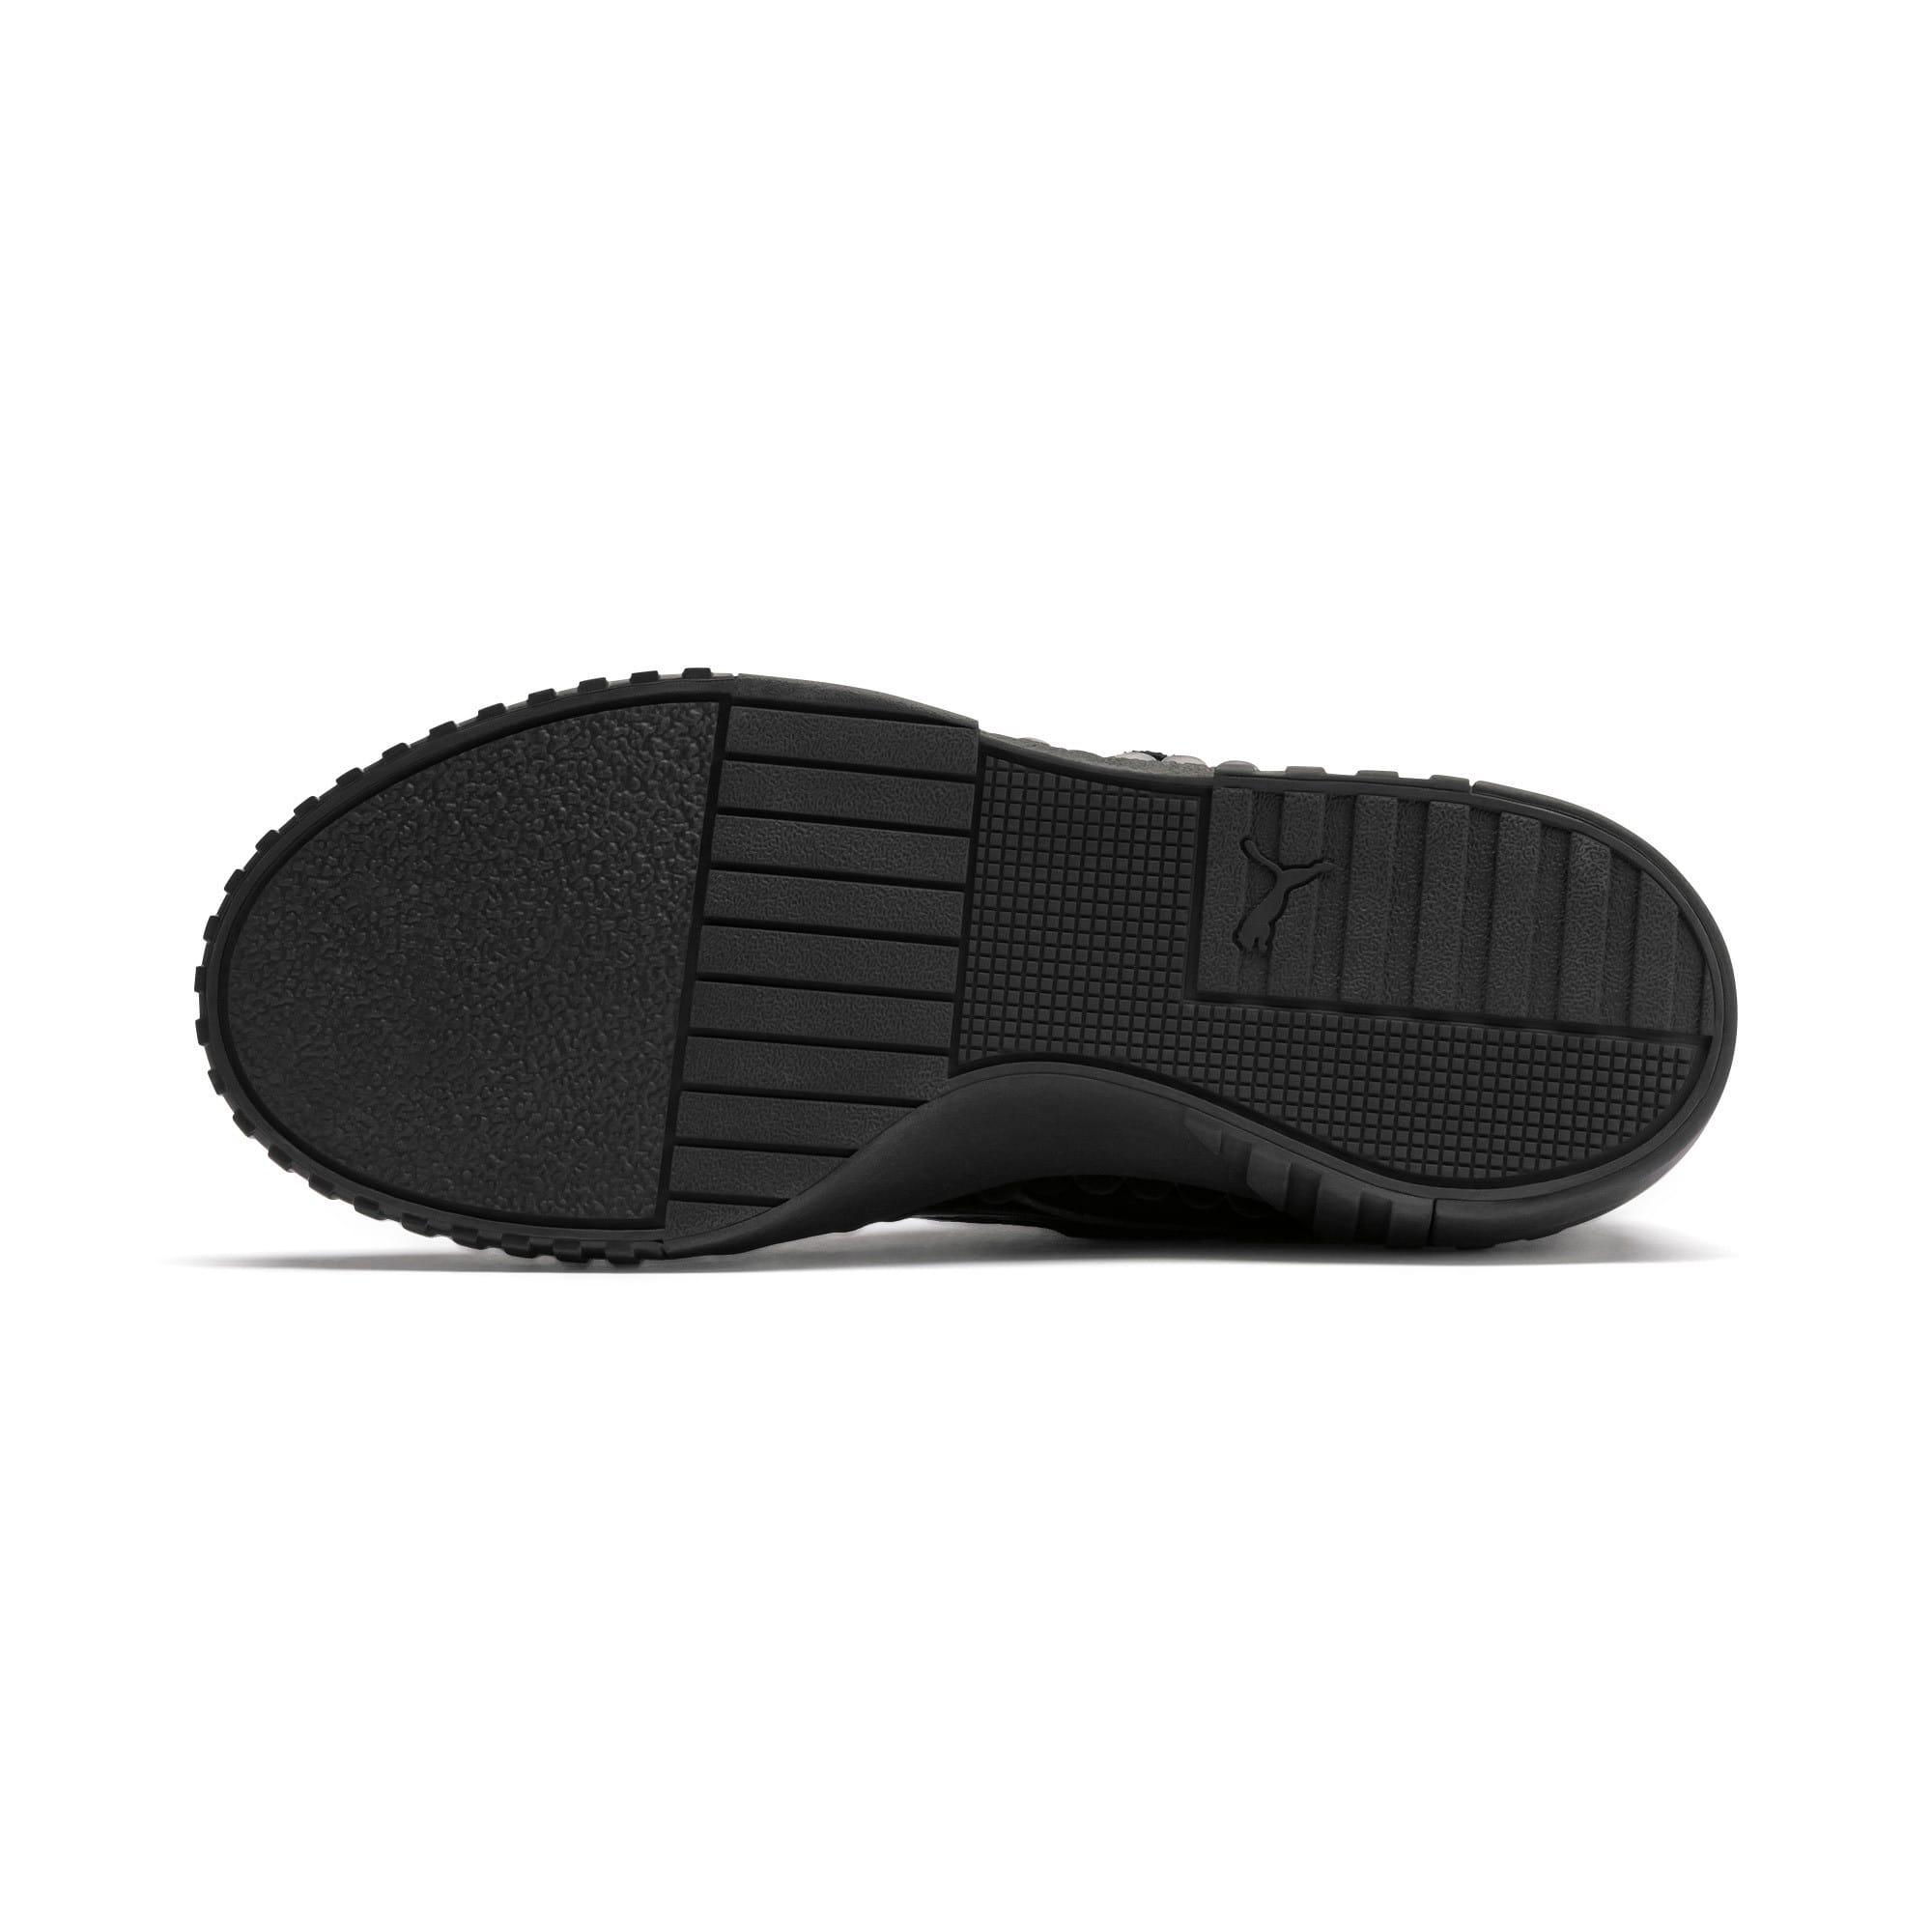 Thumbnail 5 of PUMA x TYAKASHA Cali Women's Sneakers, Puma Black, medium